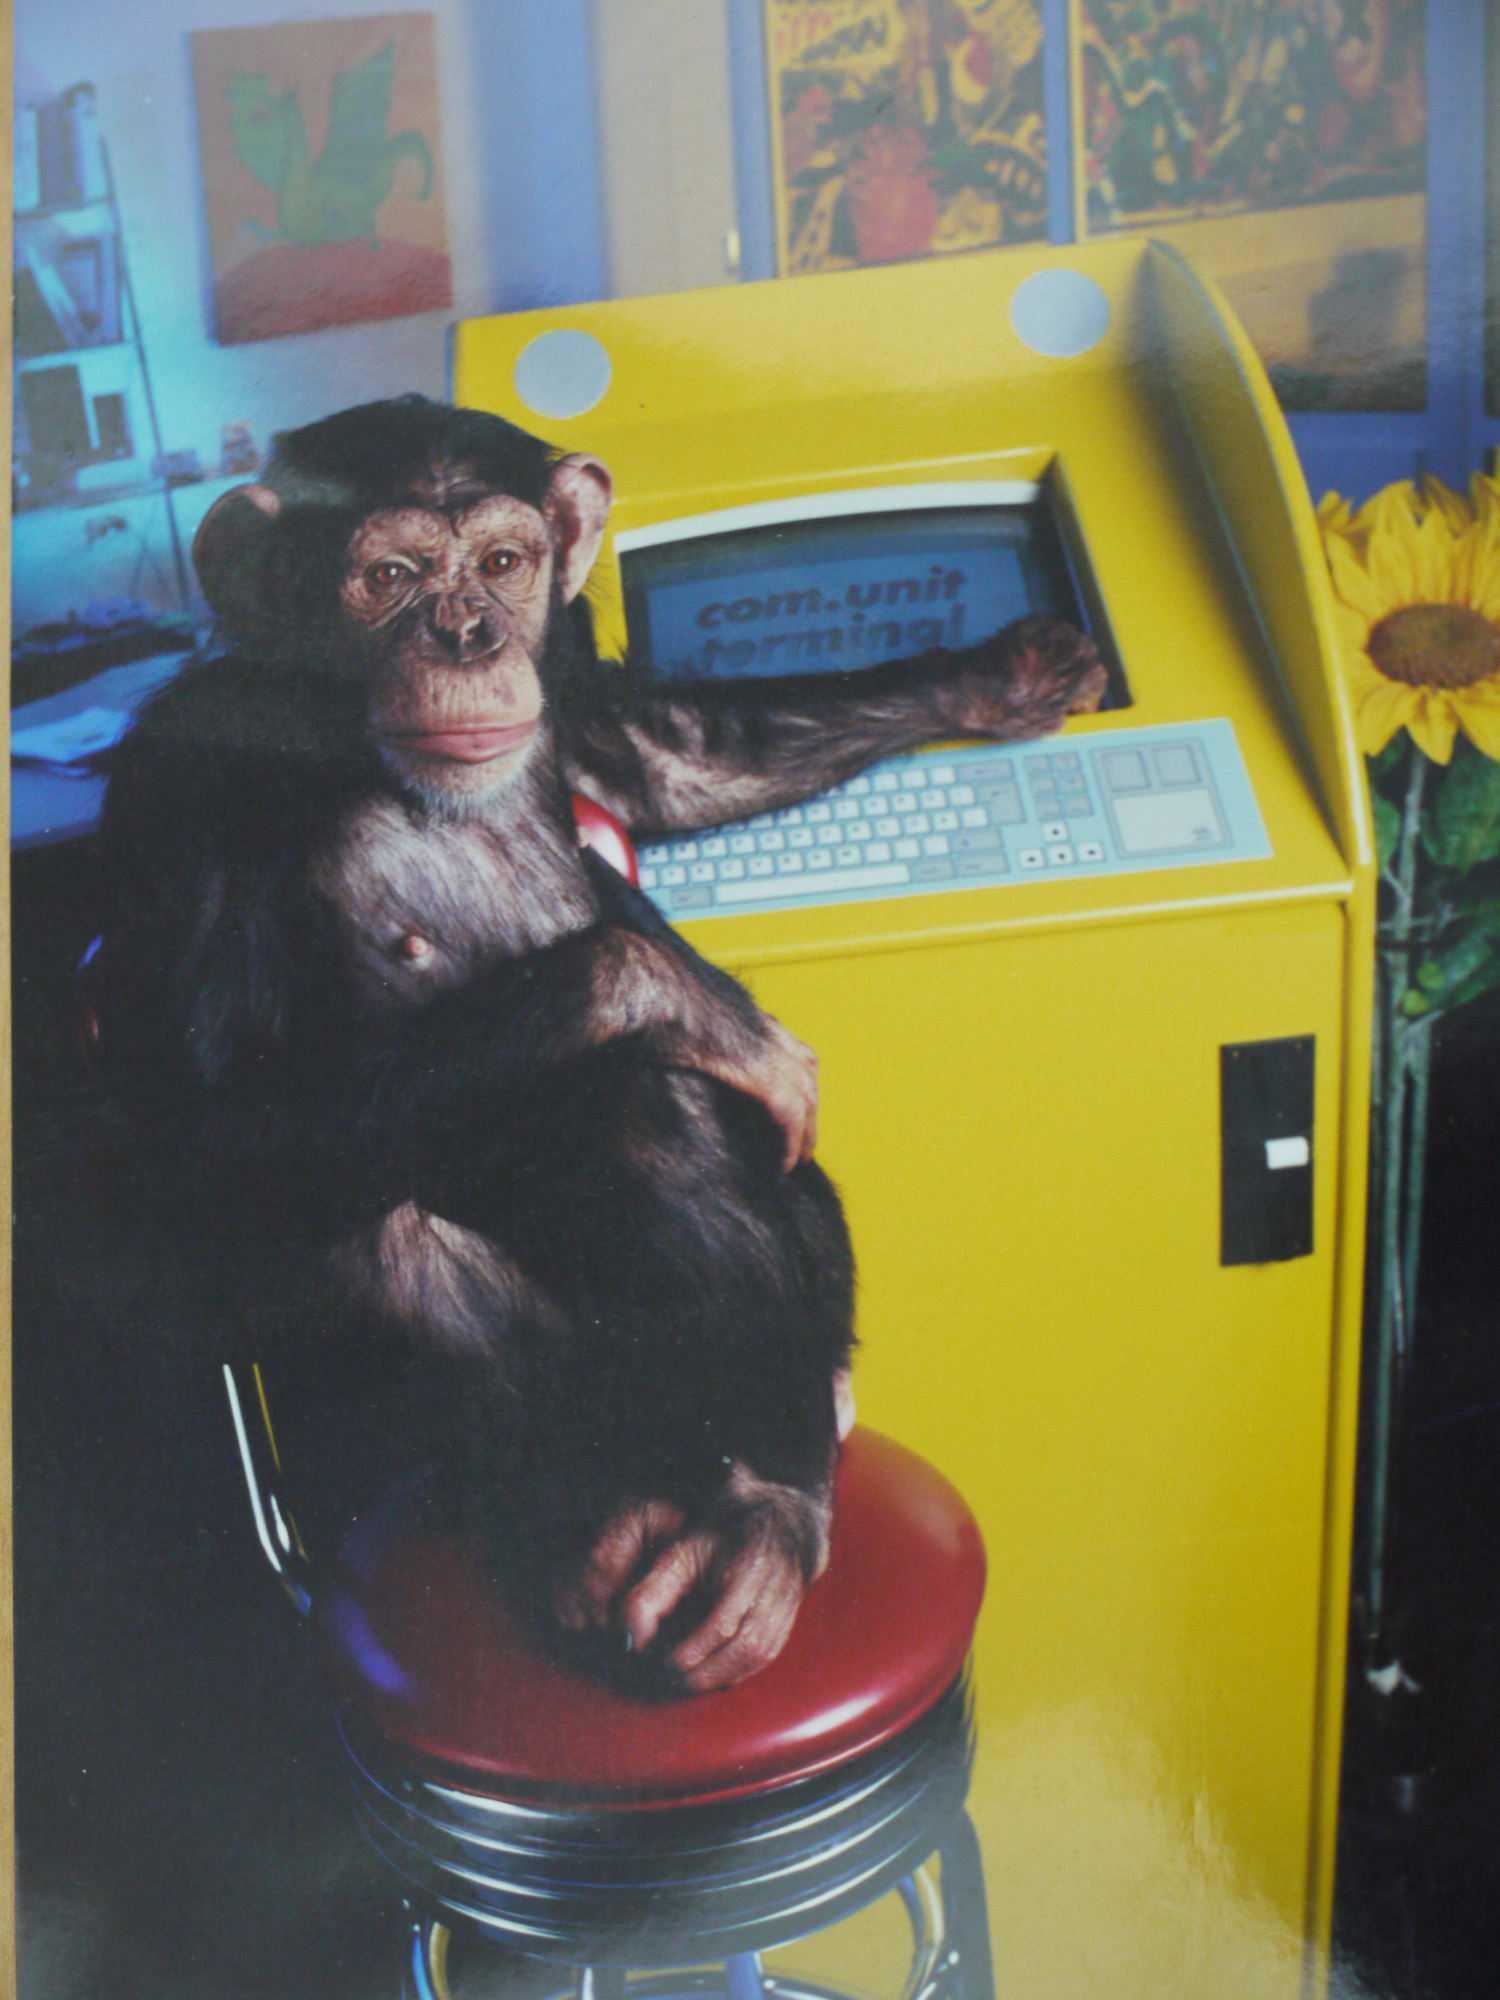 ...[ ]doch es kamen Affen